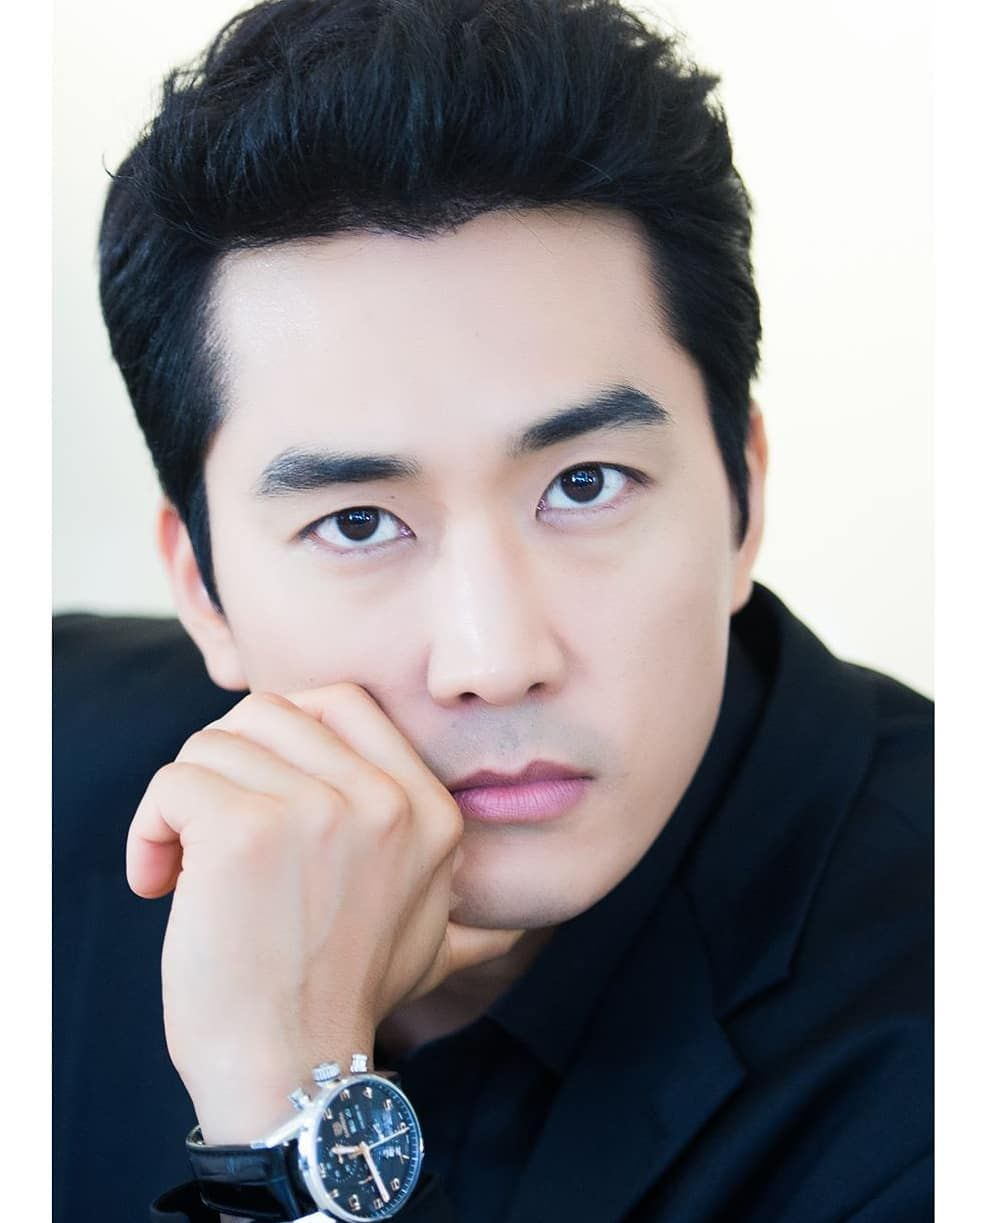 Songseungheonfans On Instagram Songseungheon Koreanstar 宋承憲 송승헌 宋承宪 Songseungheon1005 Koreanactor So In 2020 Song Seung Heon Korean Actors Joo Sang Wook